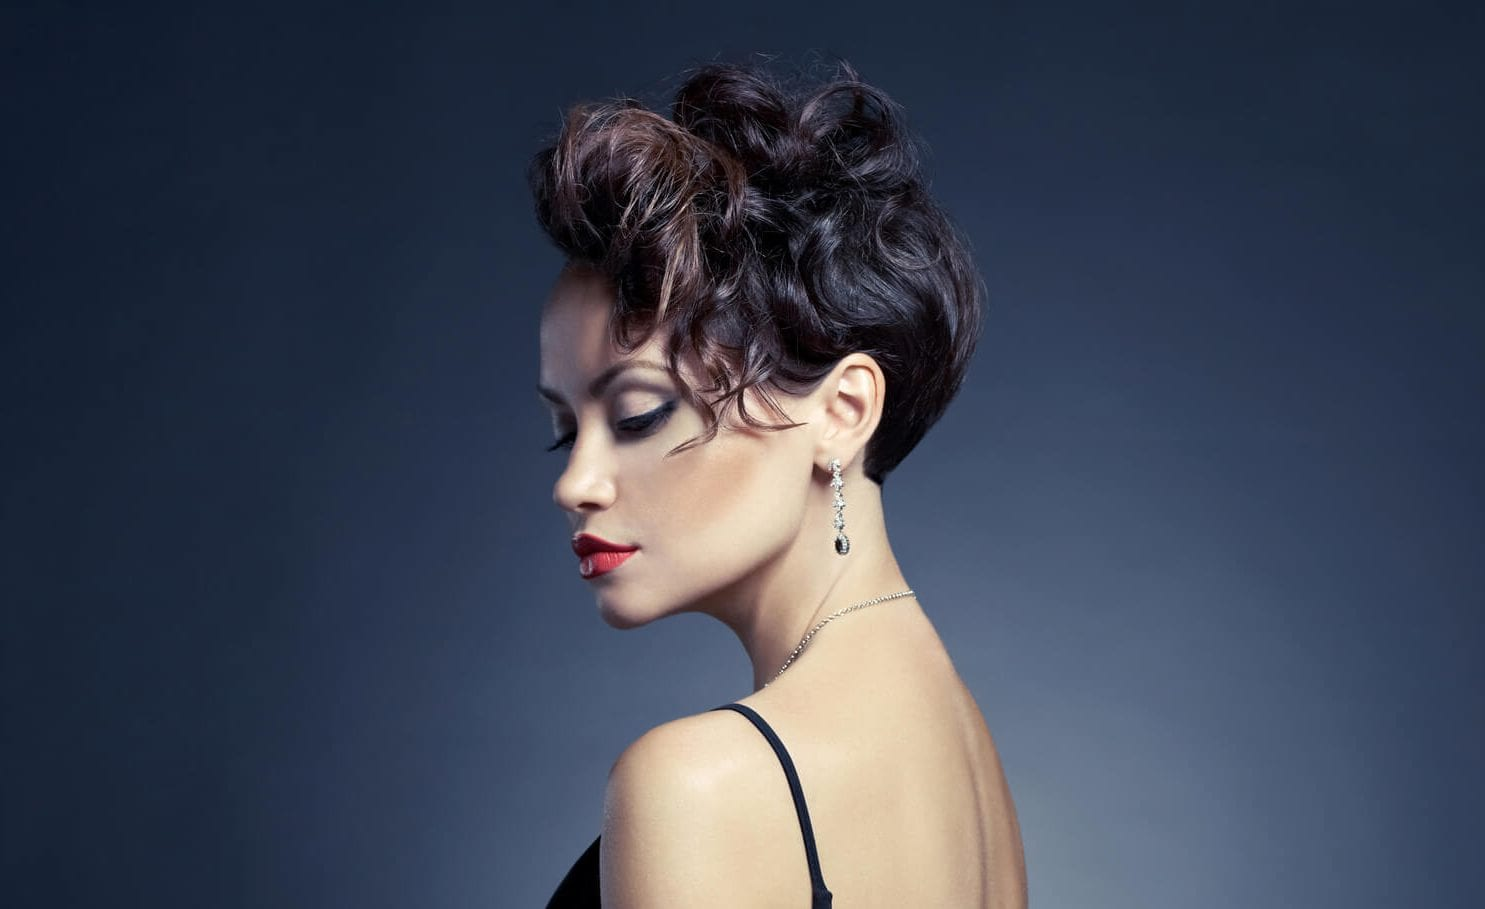 peinados formales para cabello corto ondas irregulares